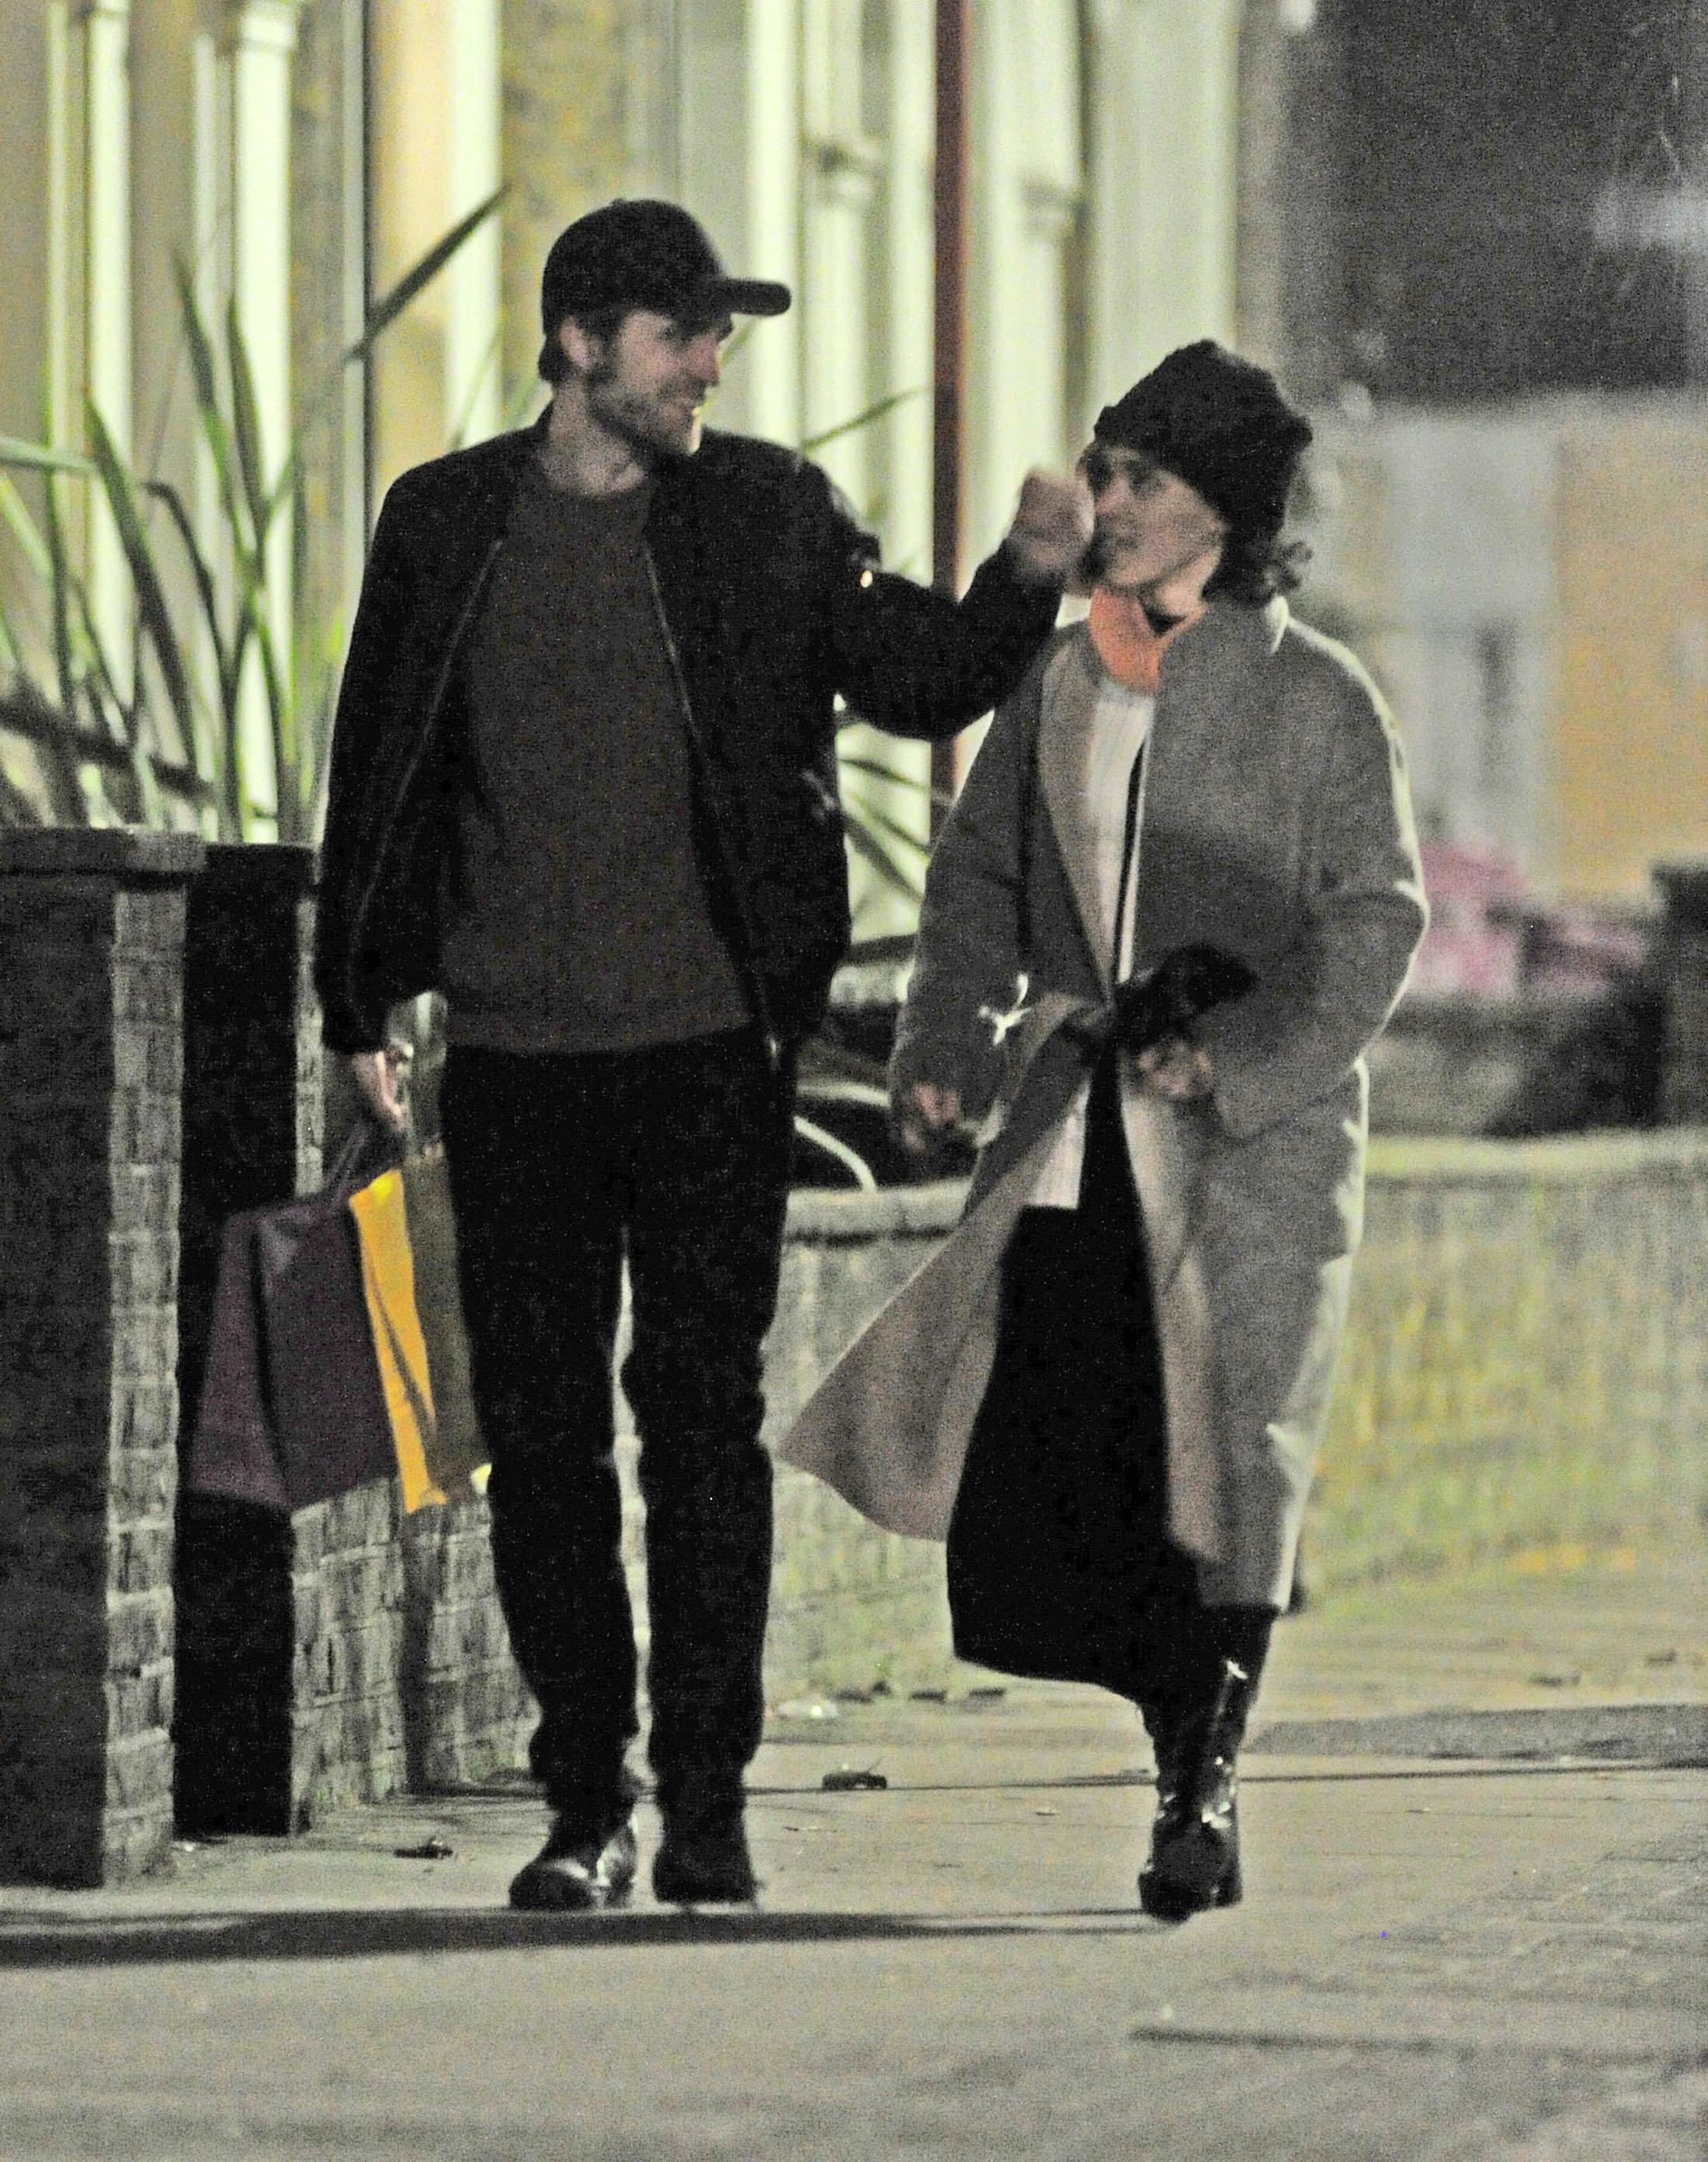 Robert Pattinson wciąż spotyka się z Kristen Stewart 2014